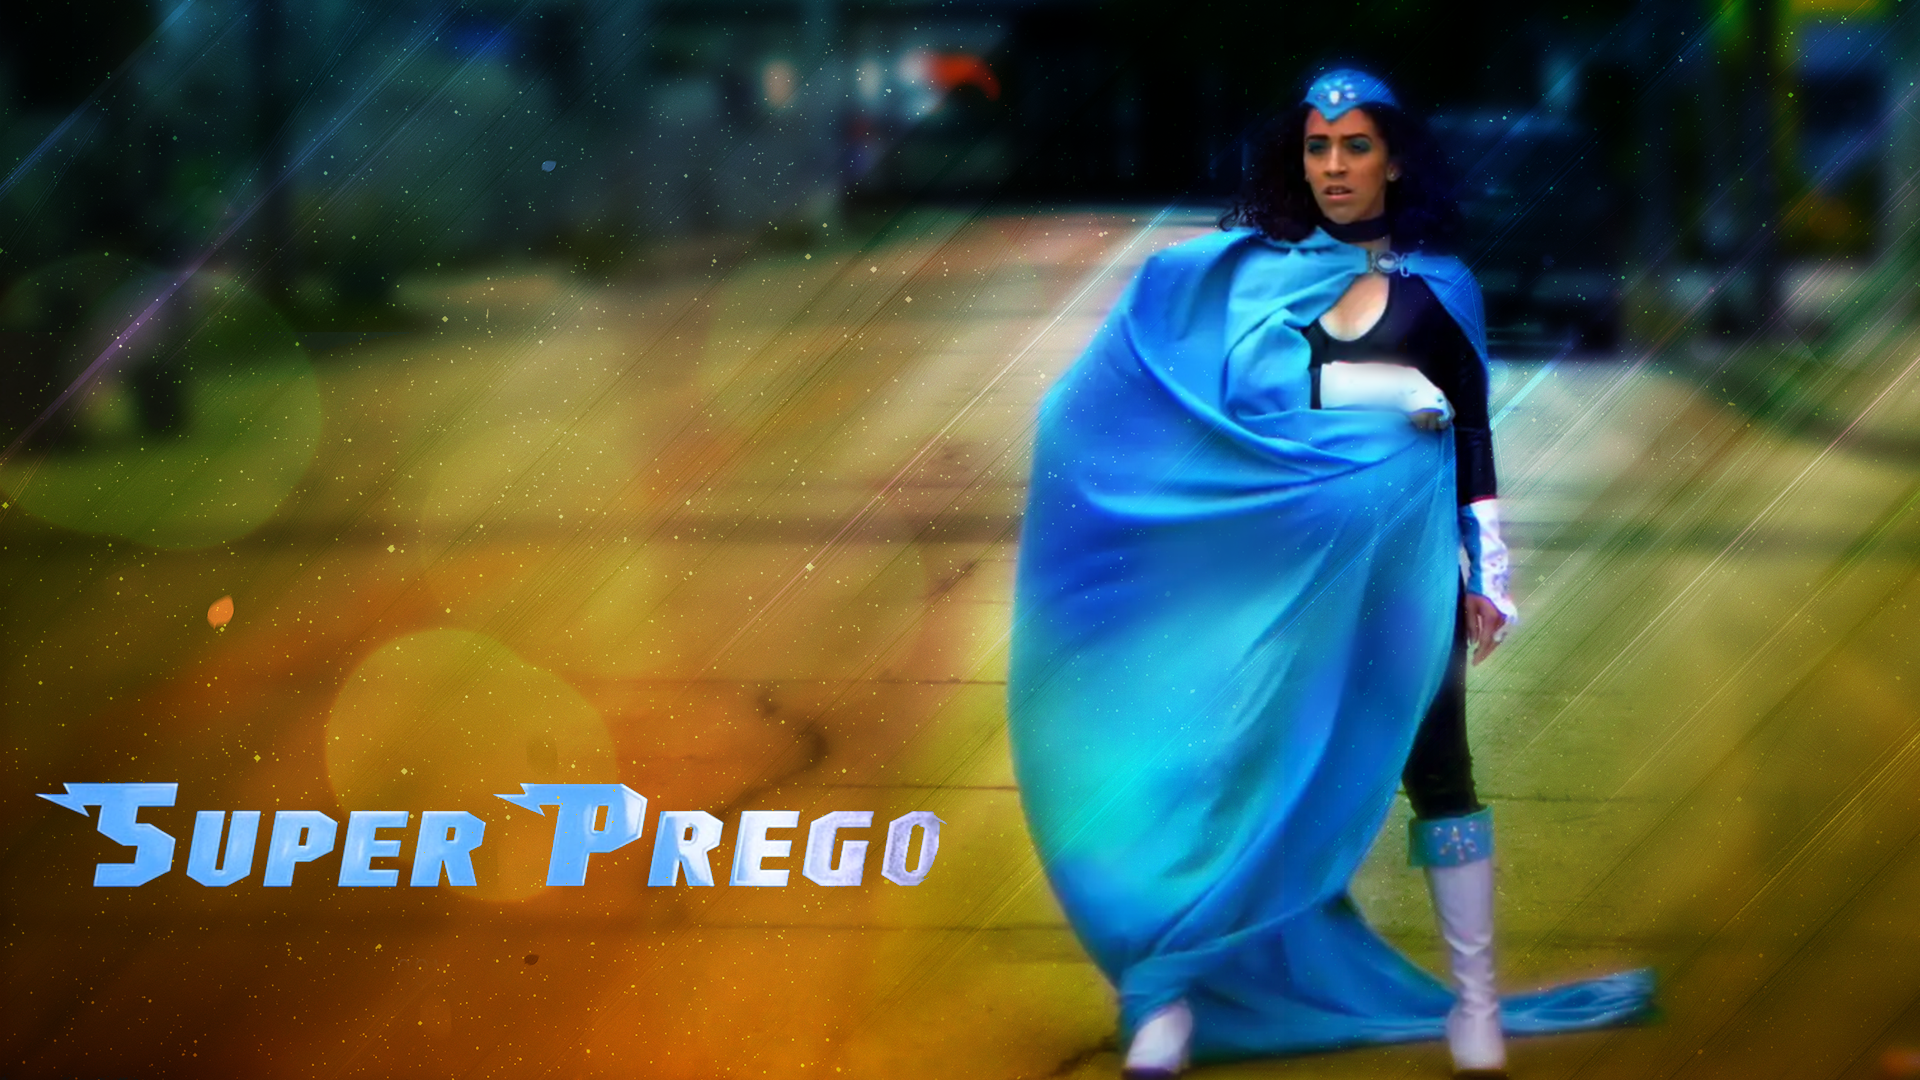 Super Prego